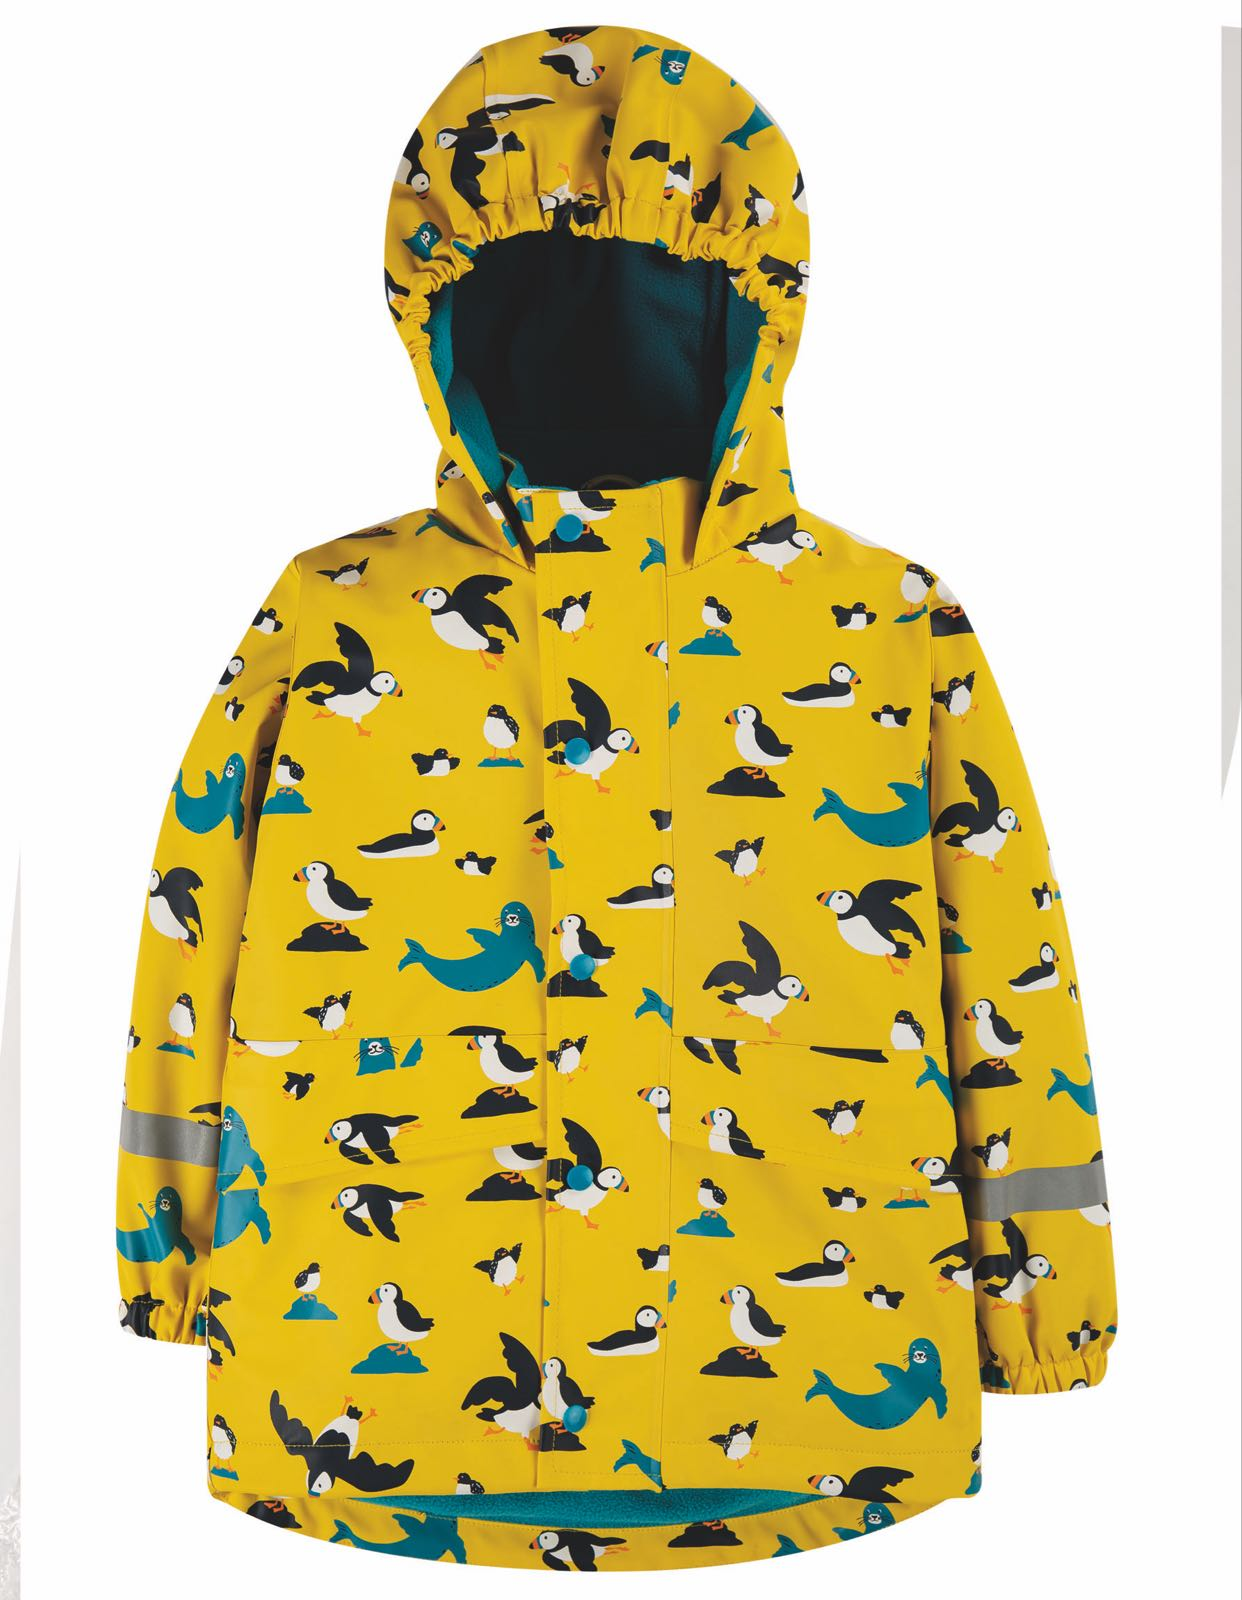 Frugi Puddle Buster Coat, Sunflower Puffling Away